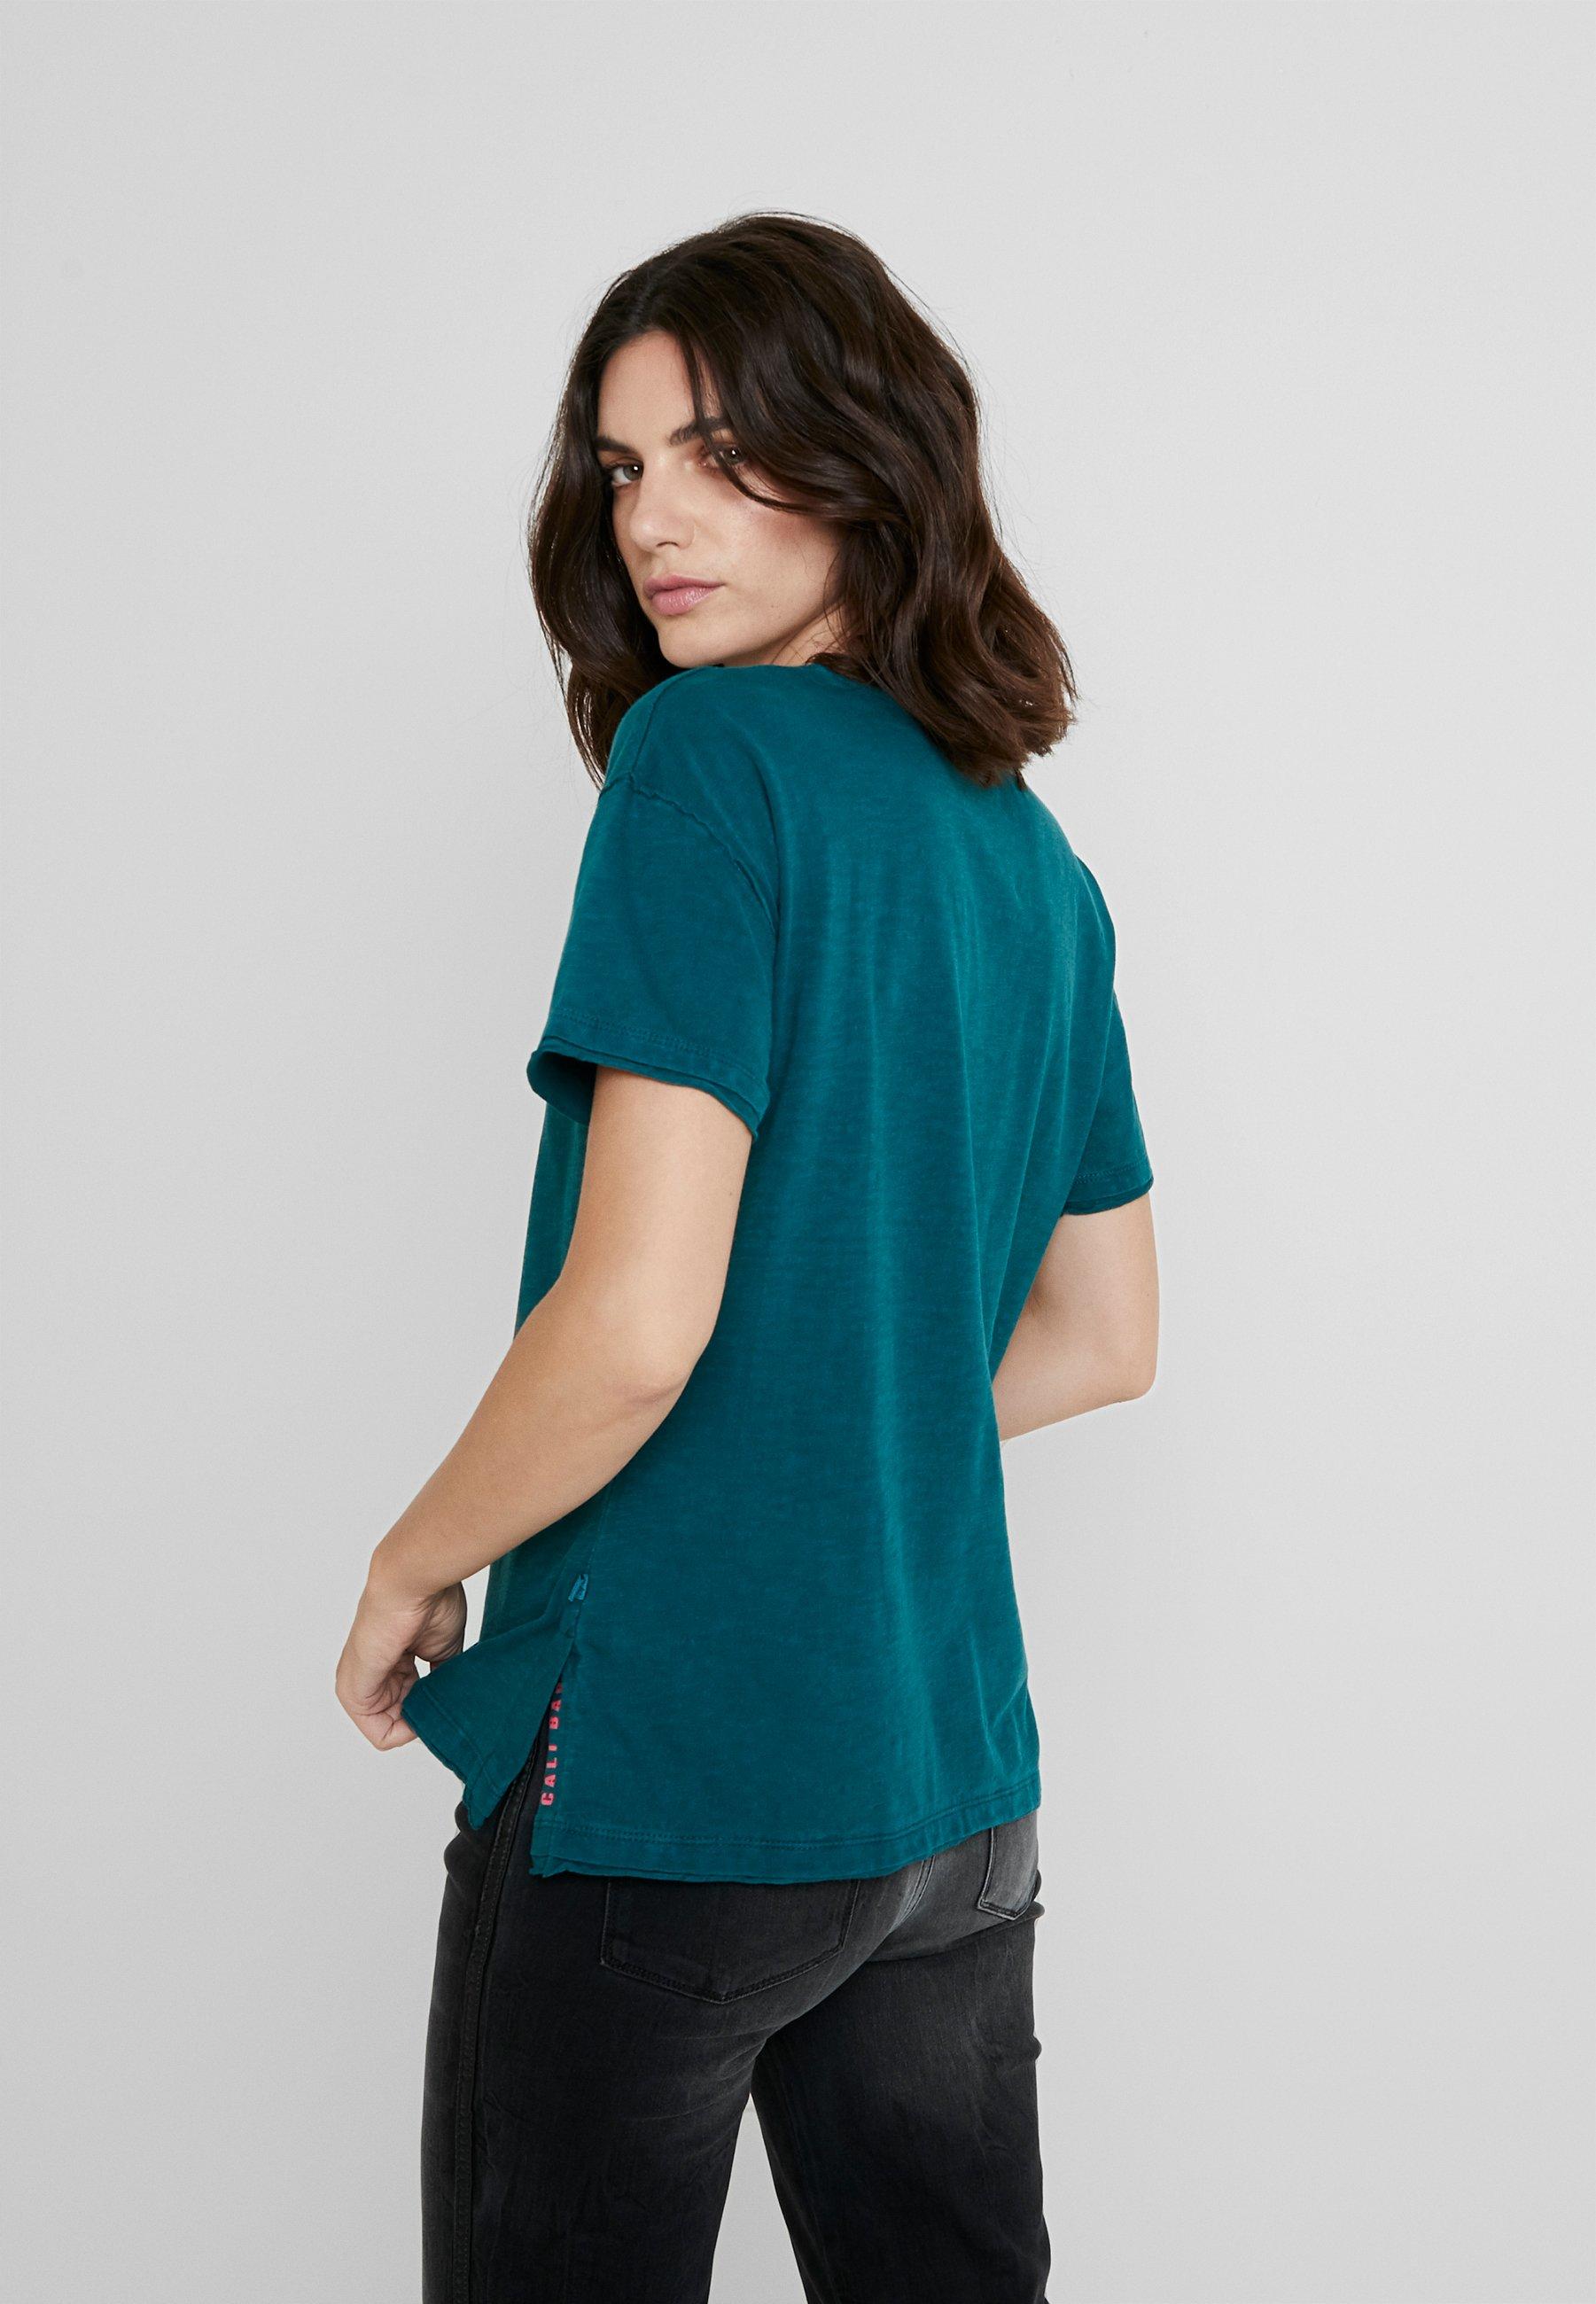 Q KurzarmT shirt Basique s Tropical Designed By Green gY7bfy6v